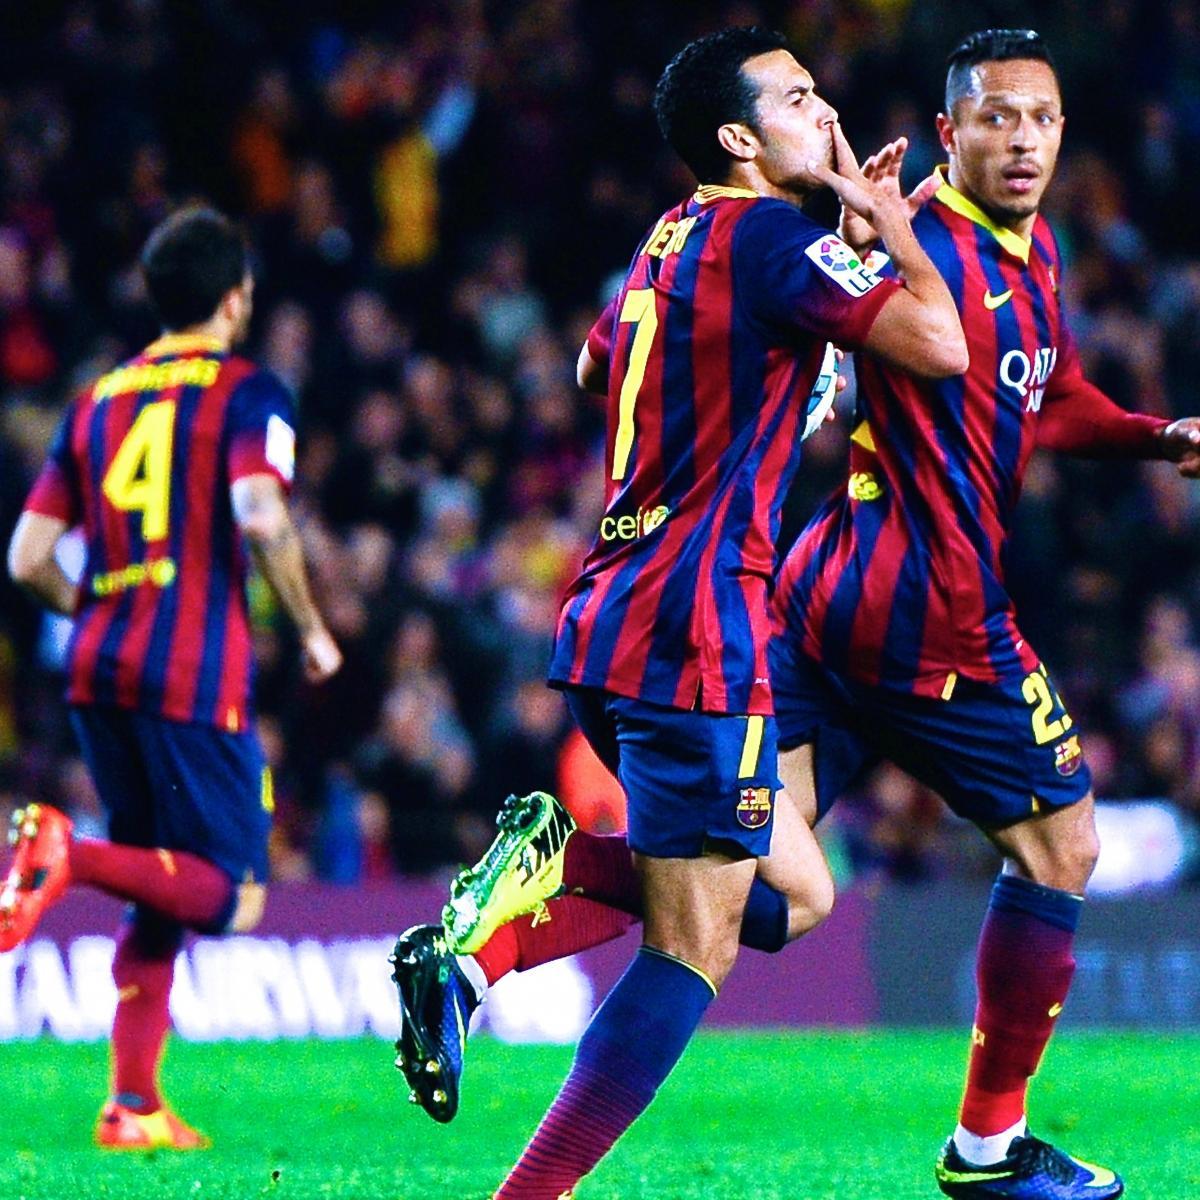 Arsenal Vs Barcelona Live Score Highlights From: Villarreal Vs. Barcelona: La Liga Live Score, Highlights